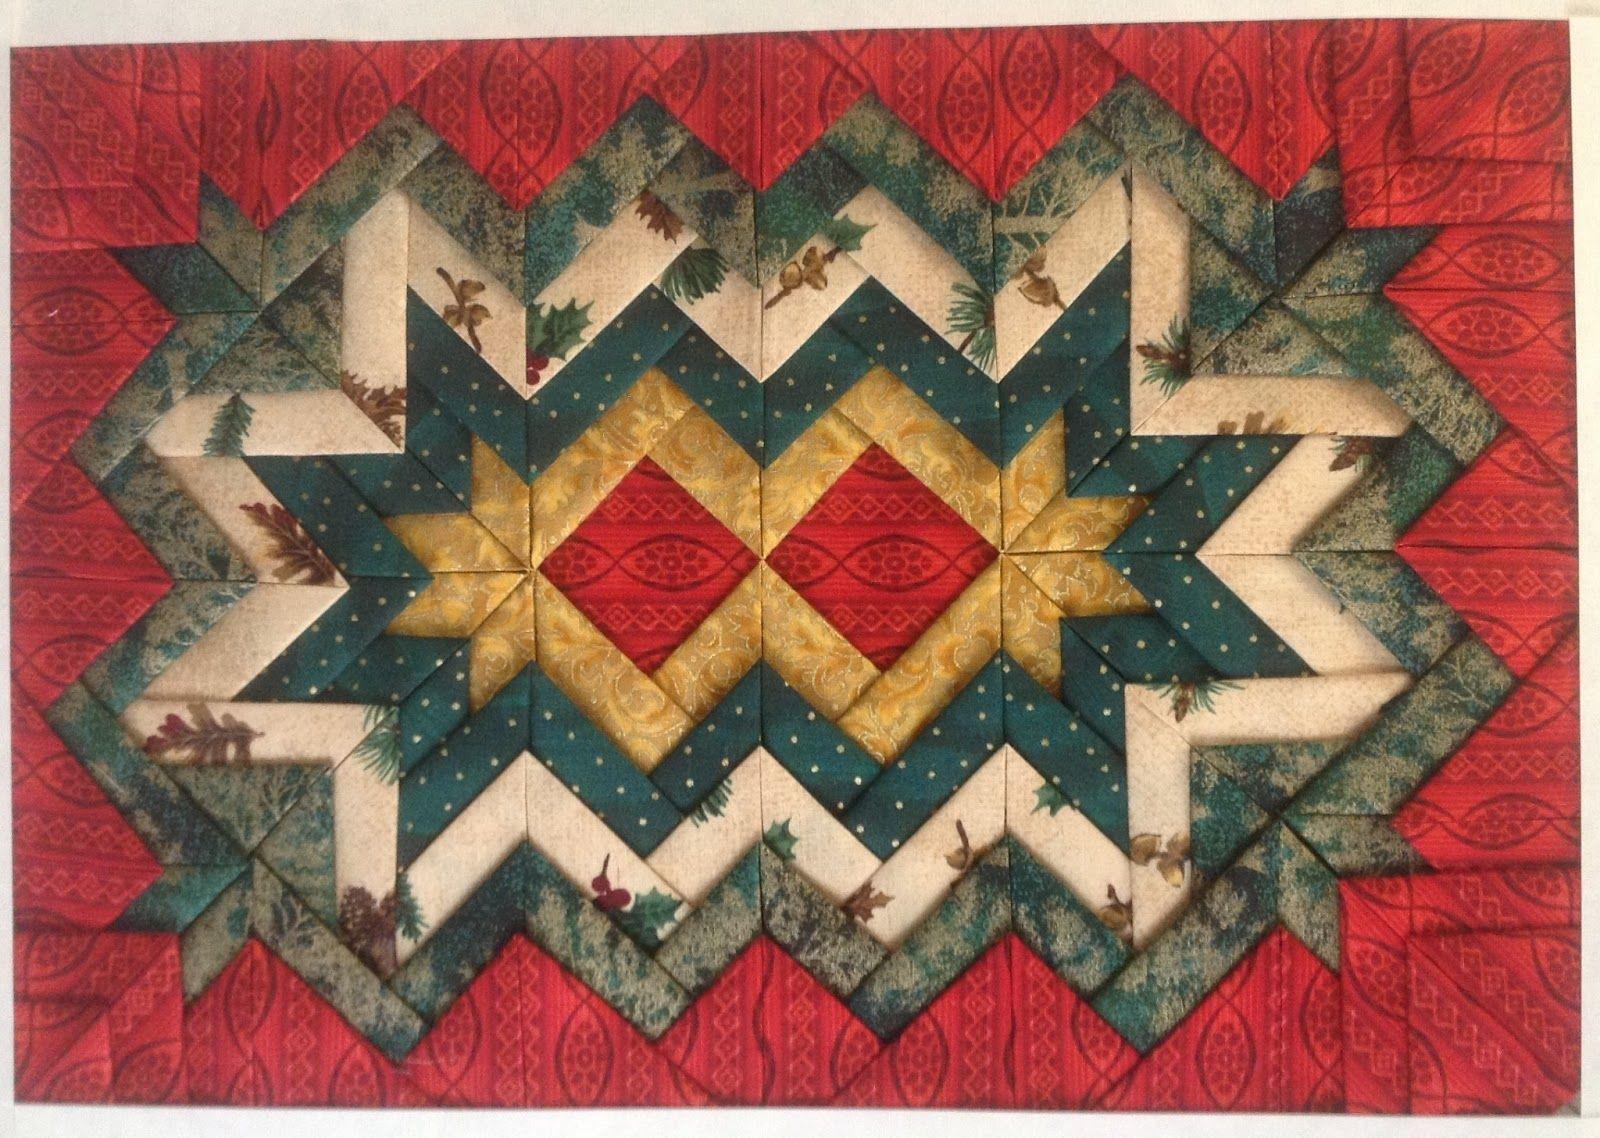 Folded Fabric Stars, Somerset Patchwork, Prairie Point Quilt ... : folded star quilt block - Adamdwight.com